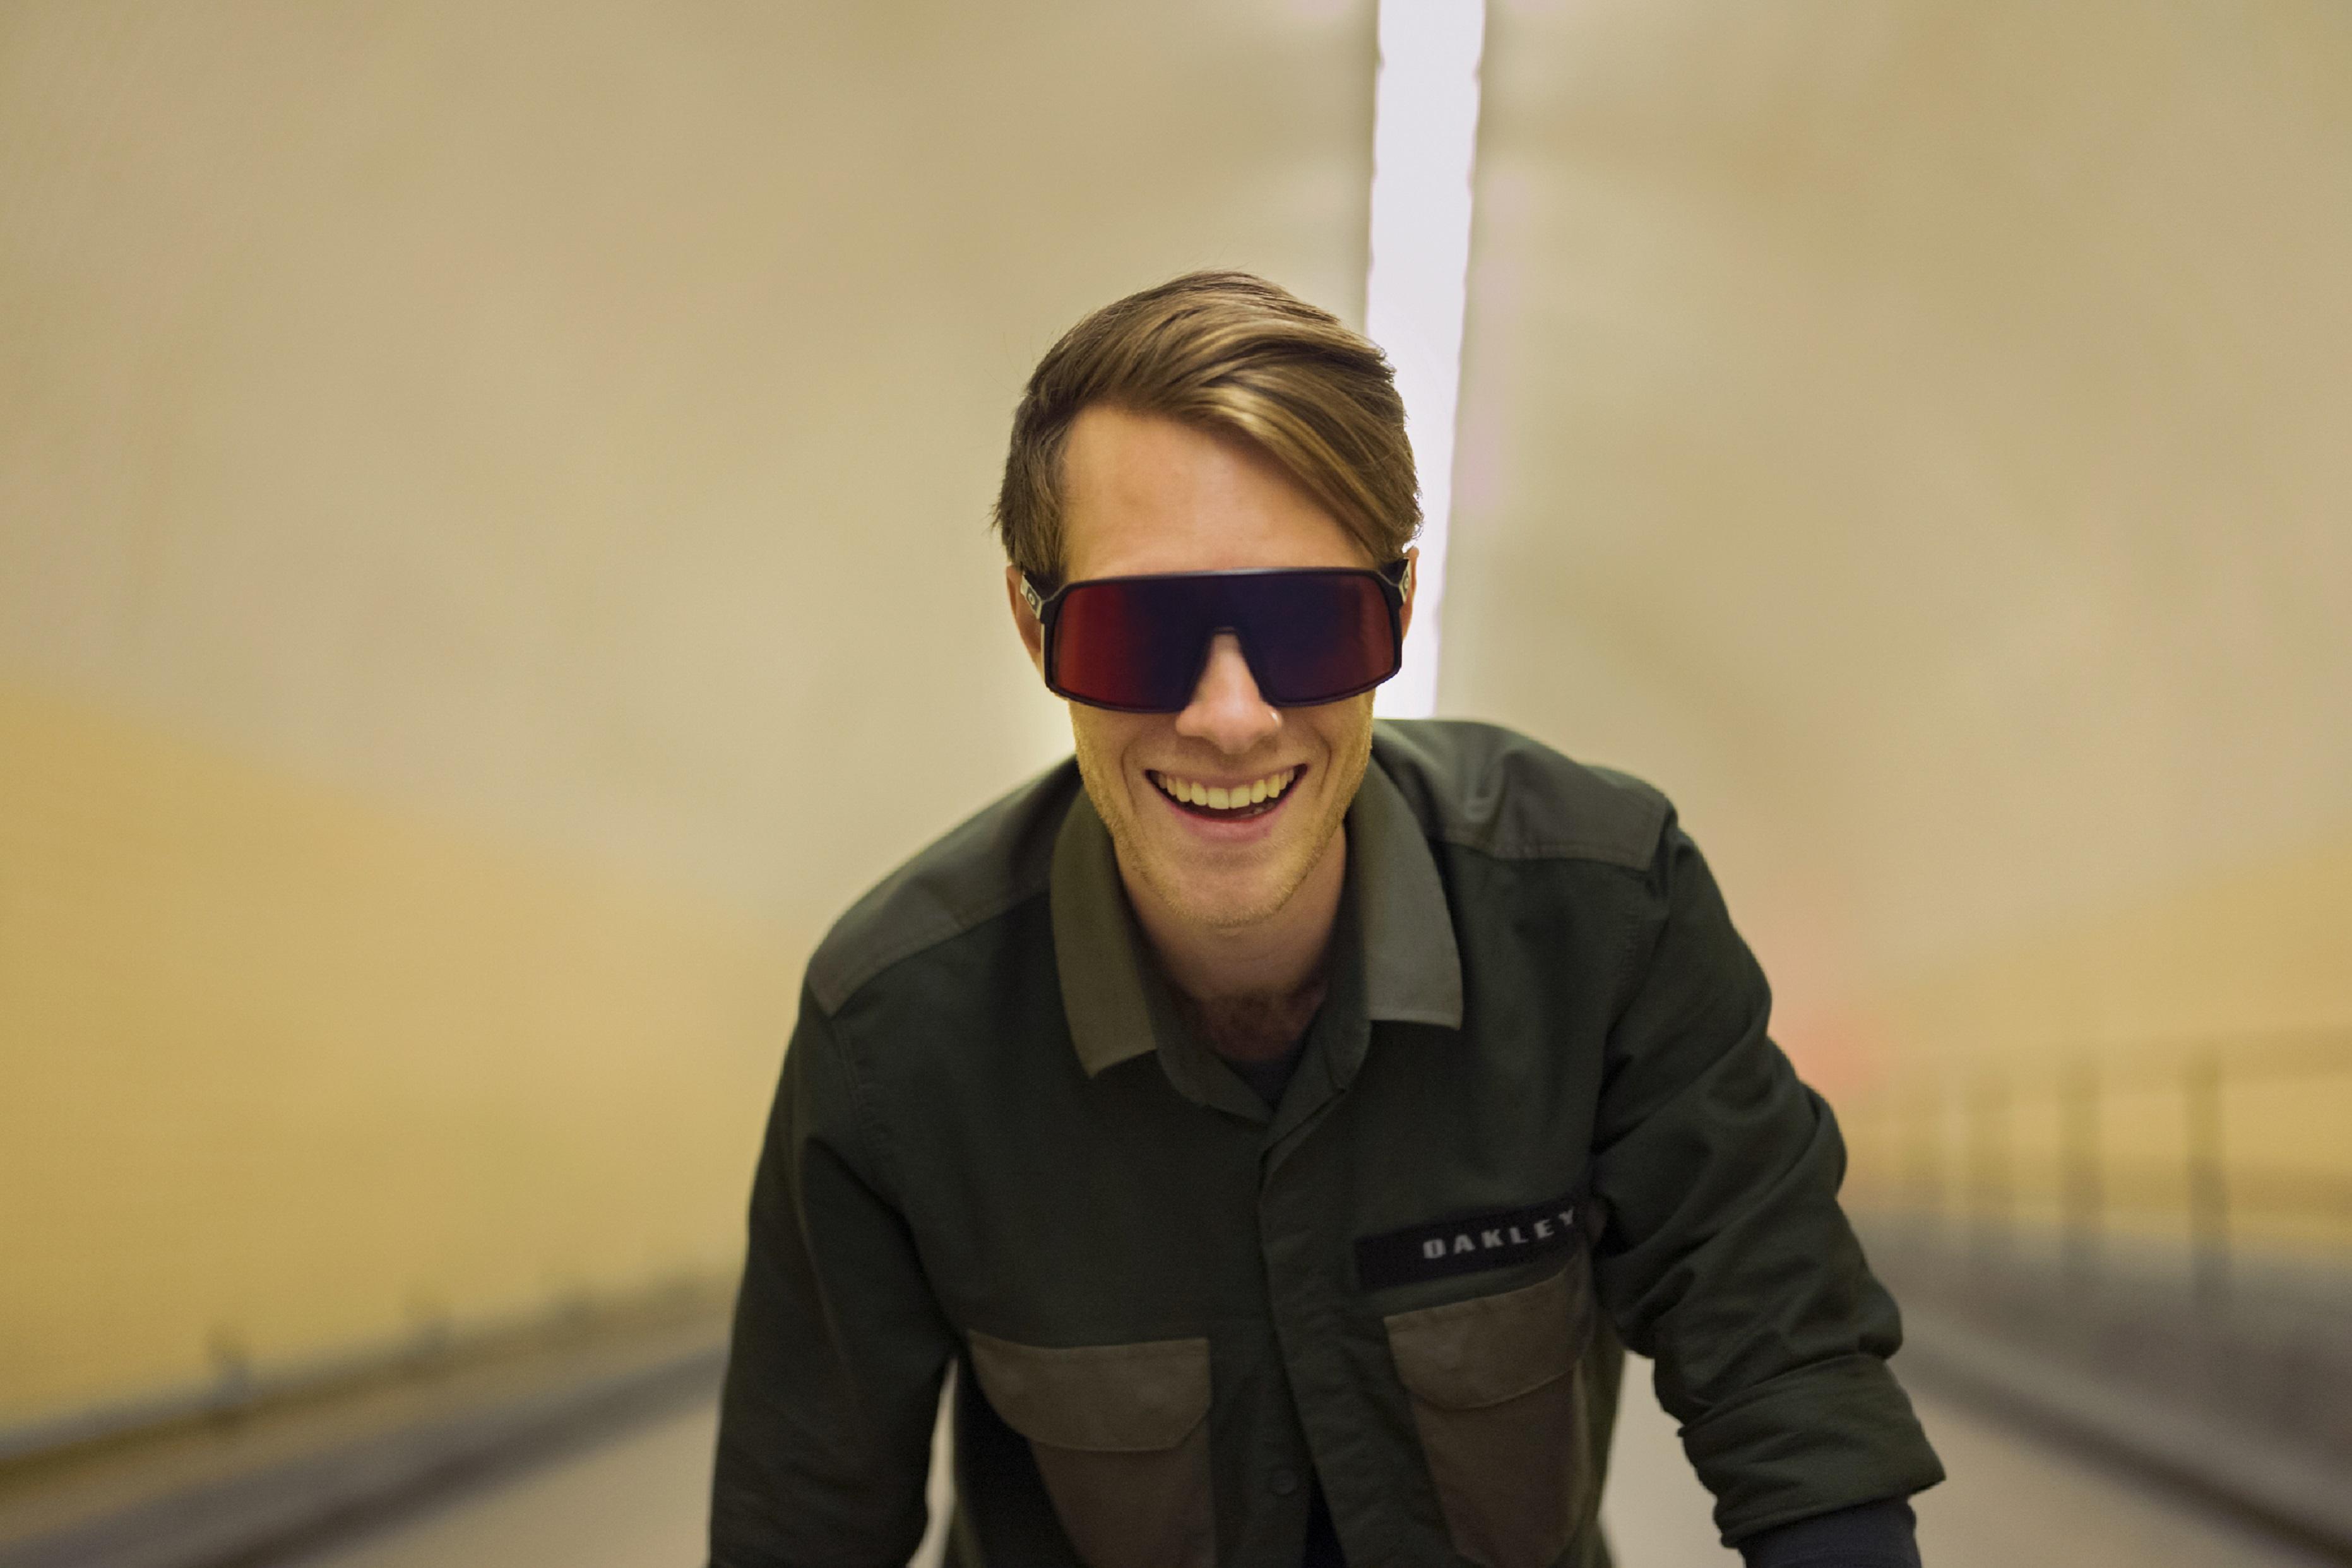 Oakley Launches Sutro Visor Style Sunglasses For Urban